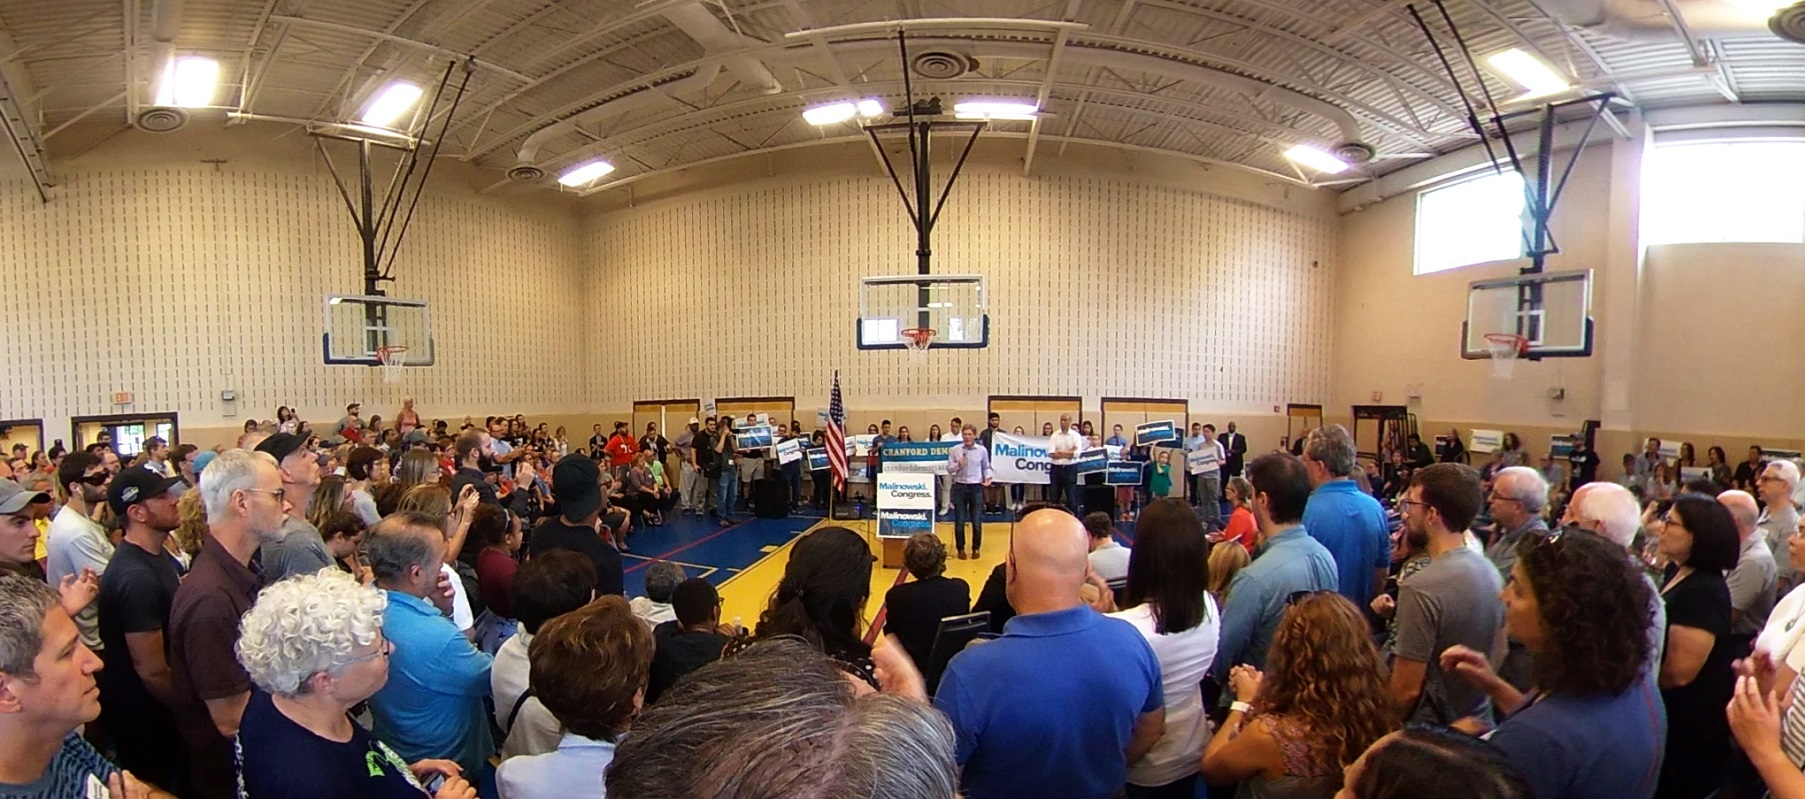 Rally in Westfield